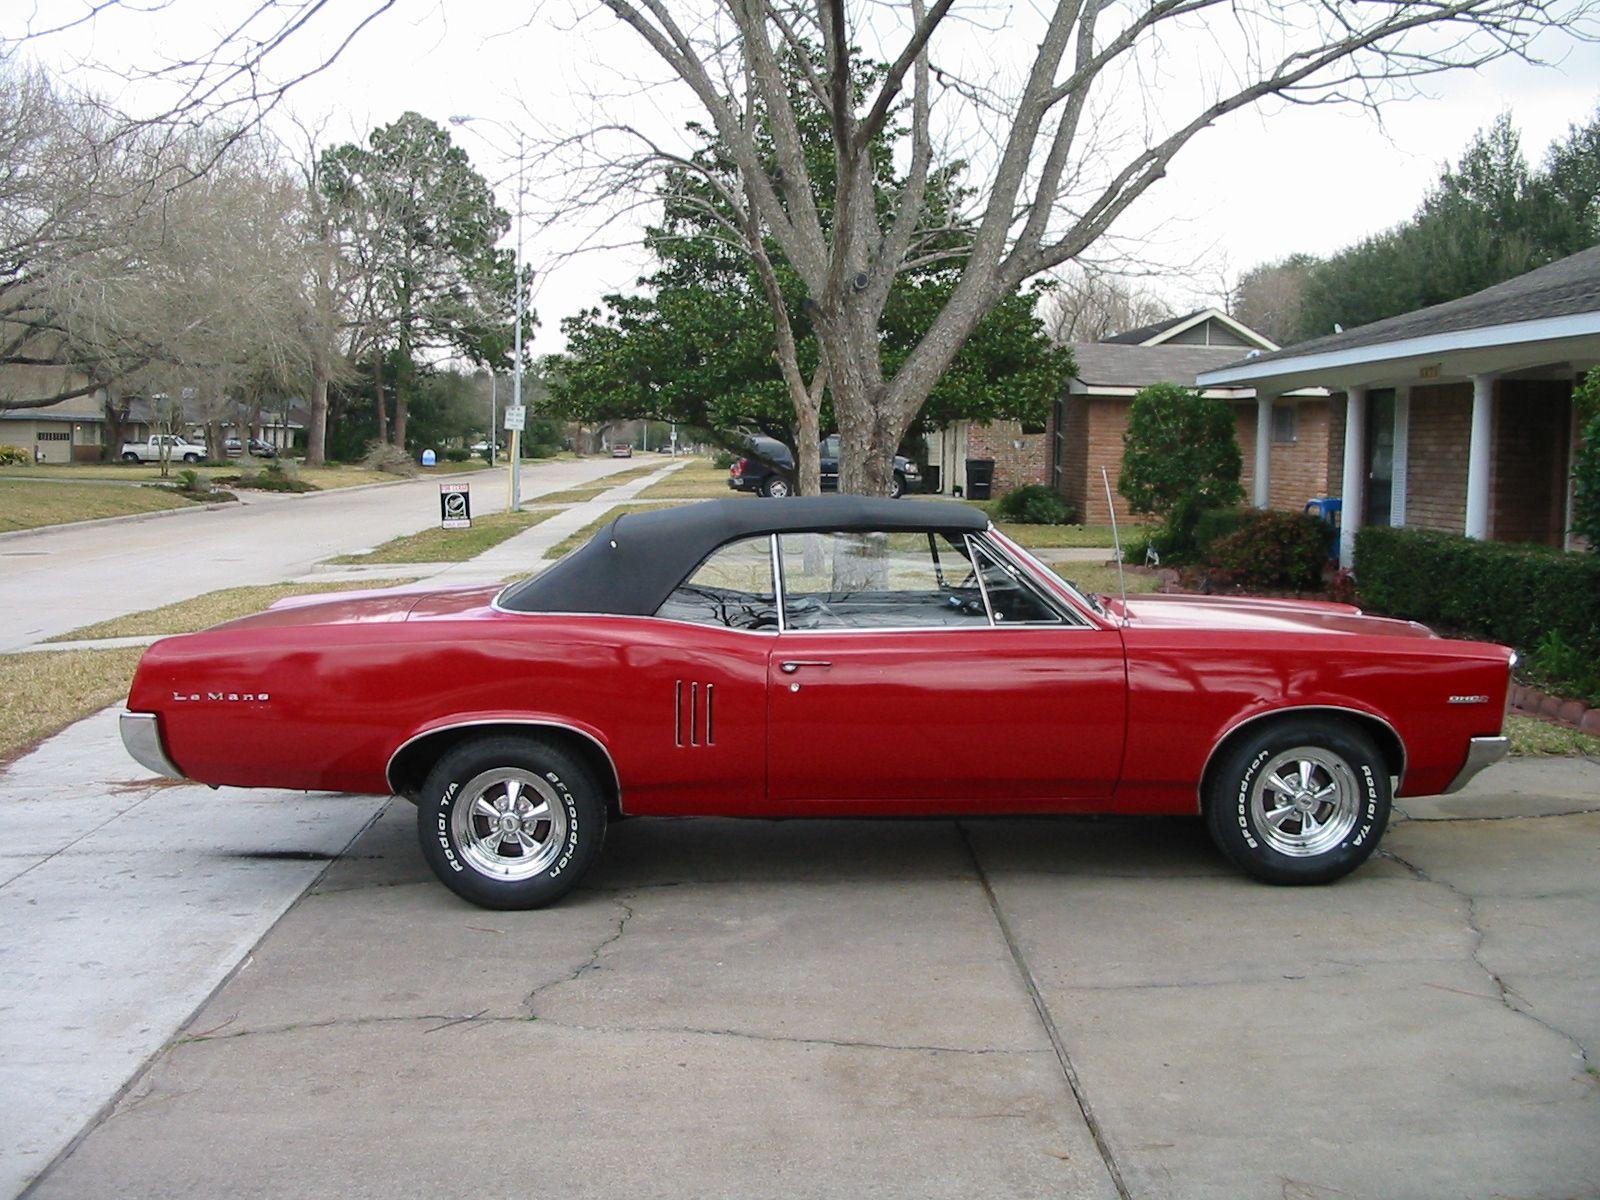 1967 pontiac LeMans | 1967 Pontiac Lemans - HOUSTON 77025 - 0 ...